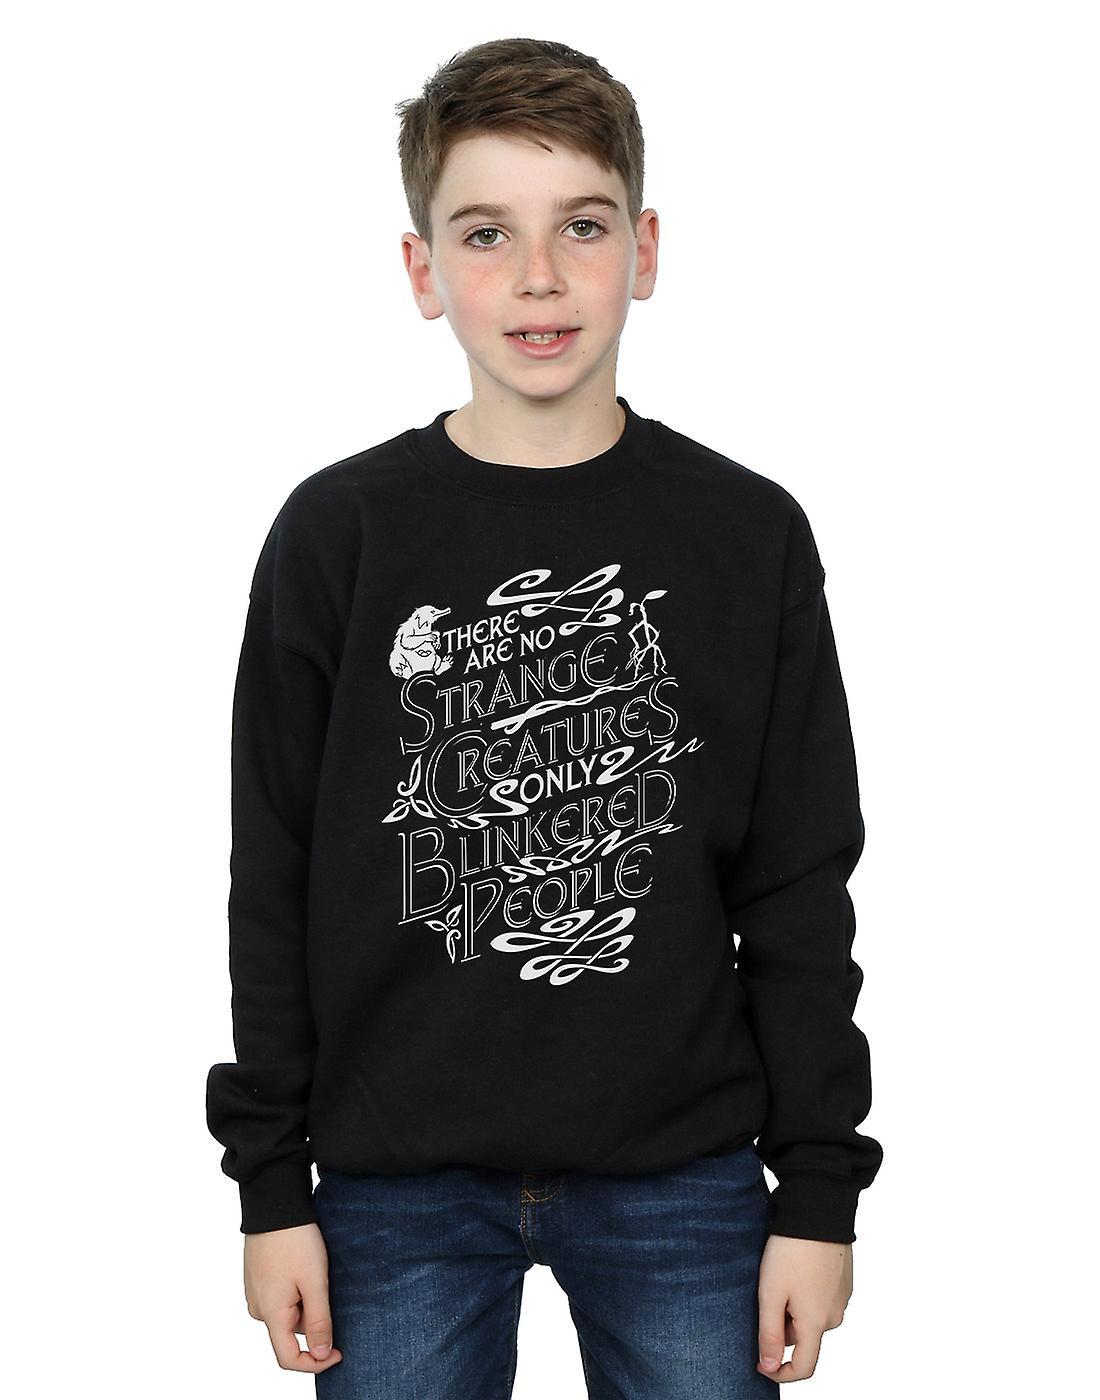 Fantastic Beasts Boys Strange Creatures Sweatshirt